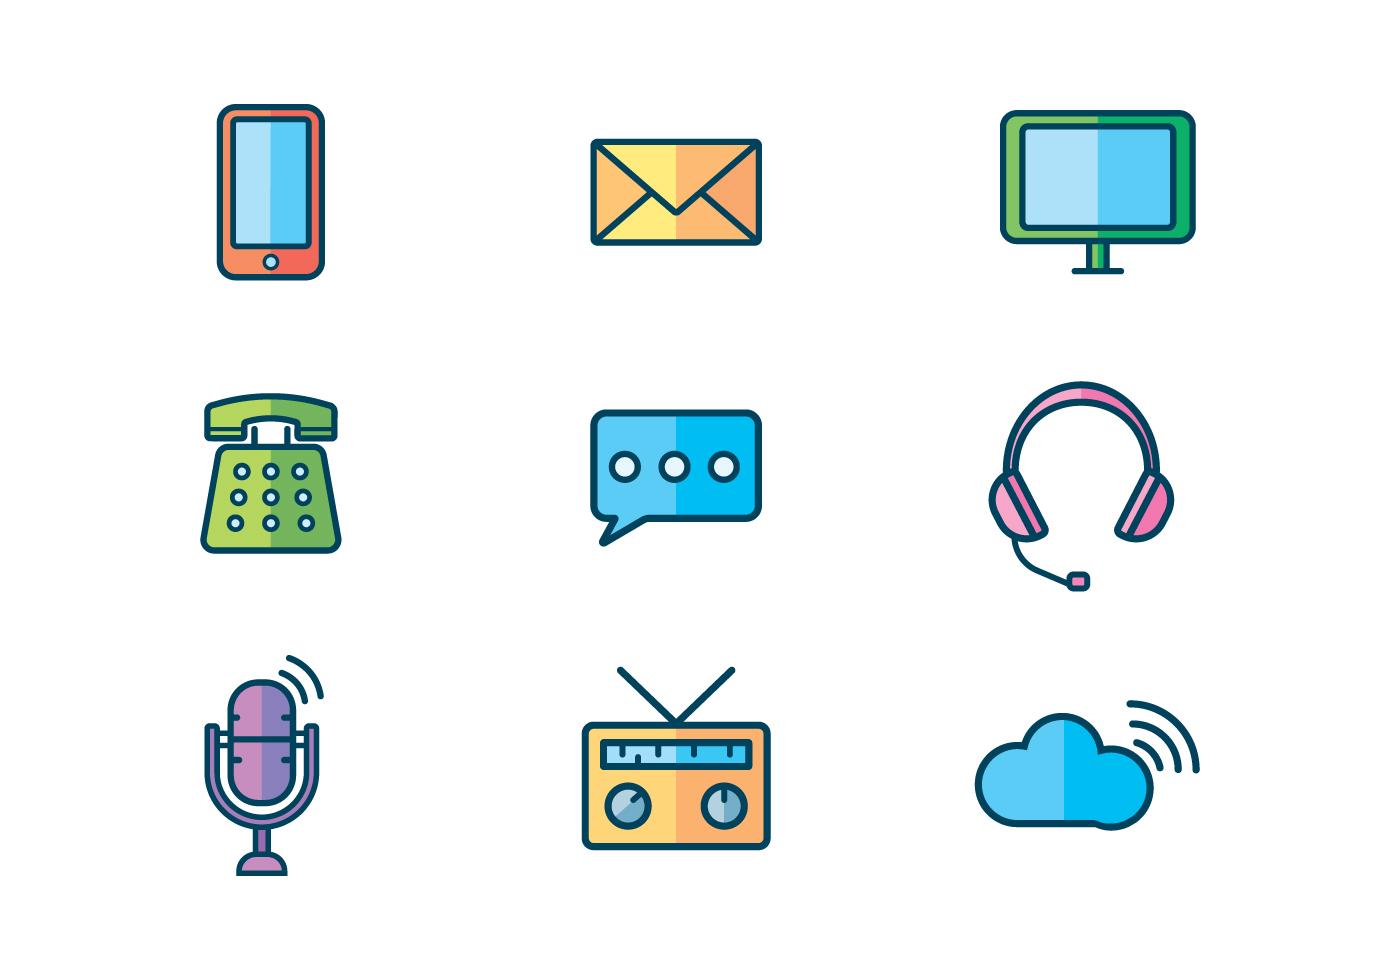 Free Communication Device Vector - Download Free Vectors, Clipart Graphics & Vector Art